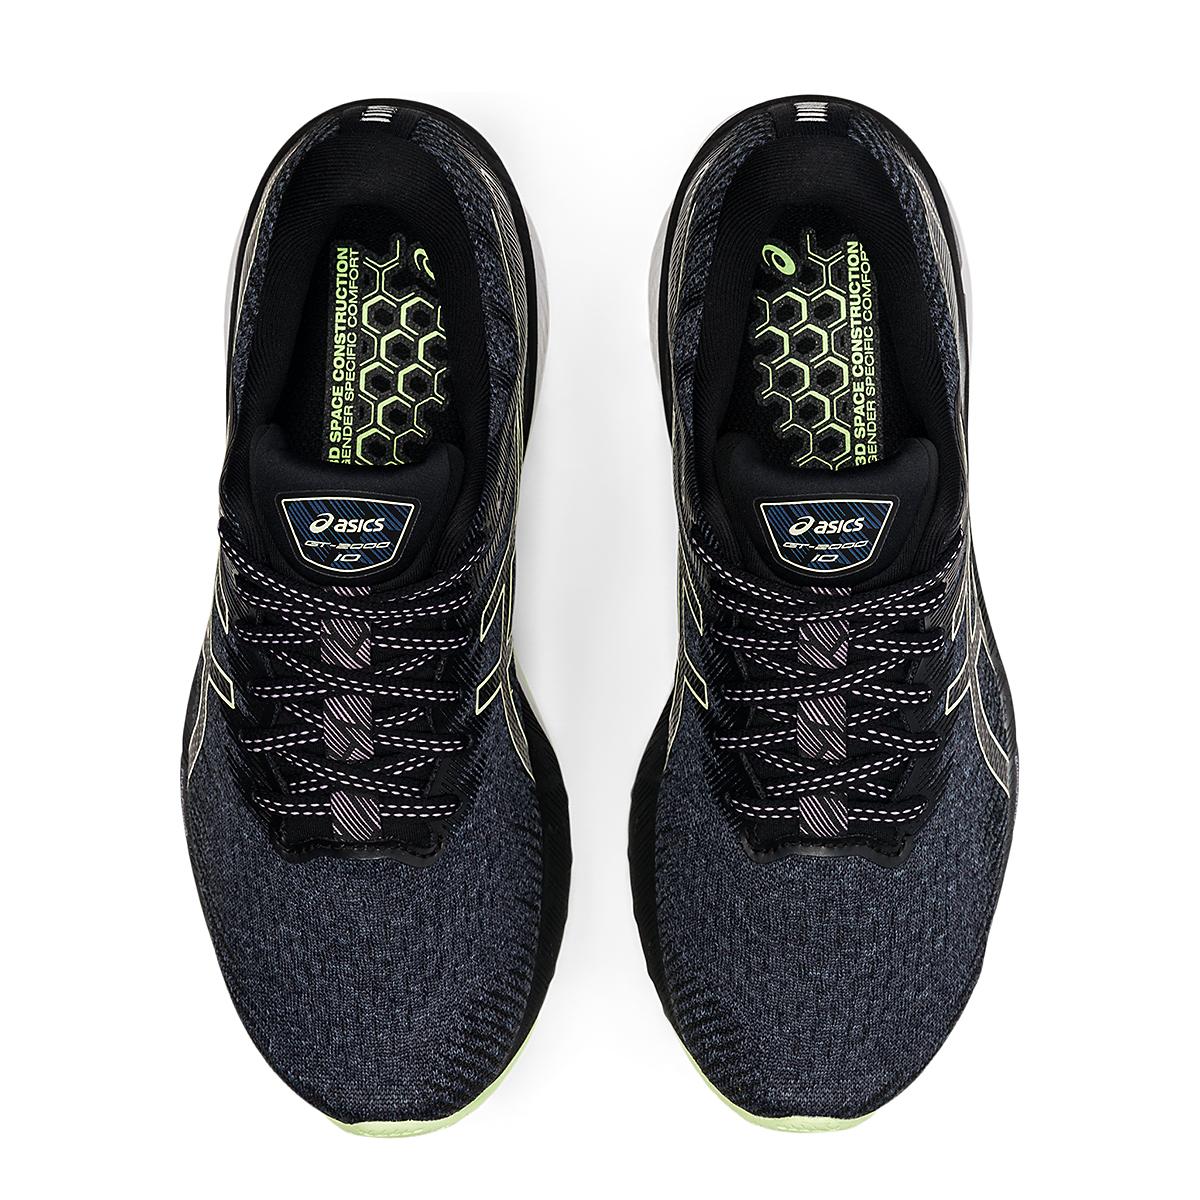 Women's Asics GT-2000 10 Running Shoe - Color: Soft Lavender/Black - Size: 5 - Width: Wide, Soft Lavender/Black, large, image 6